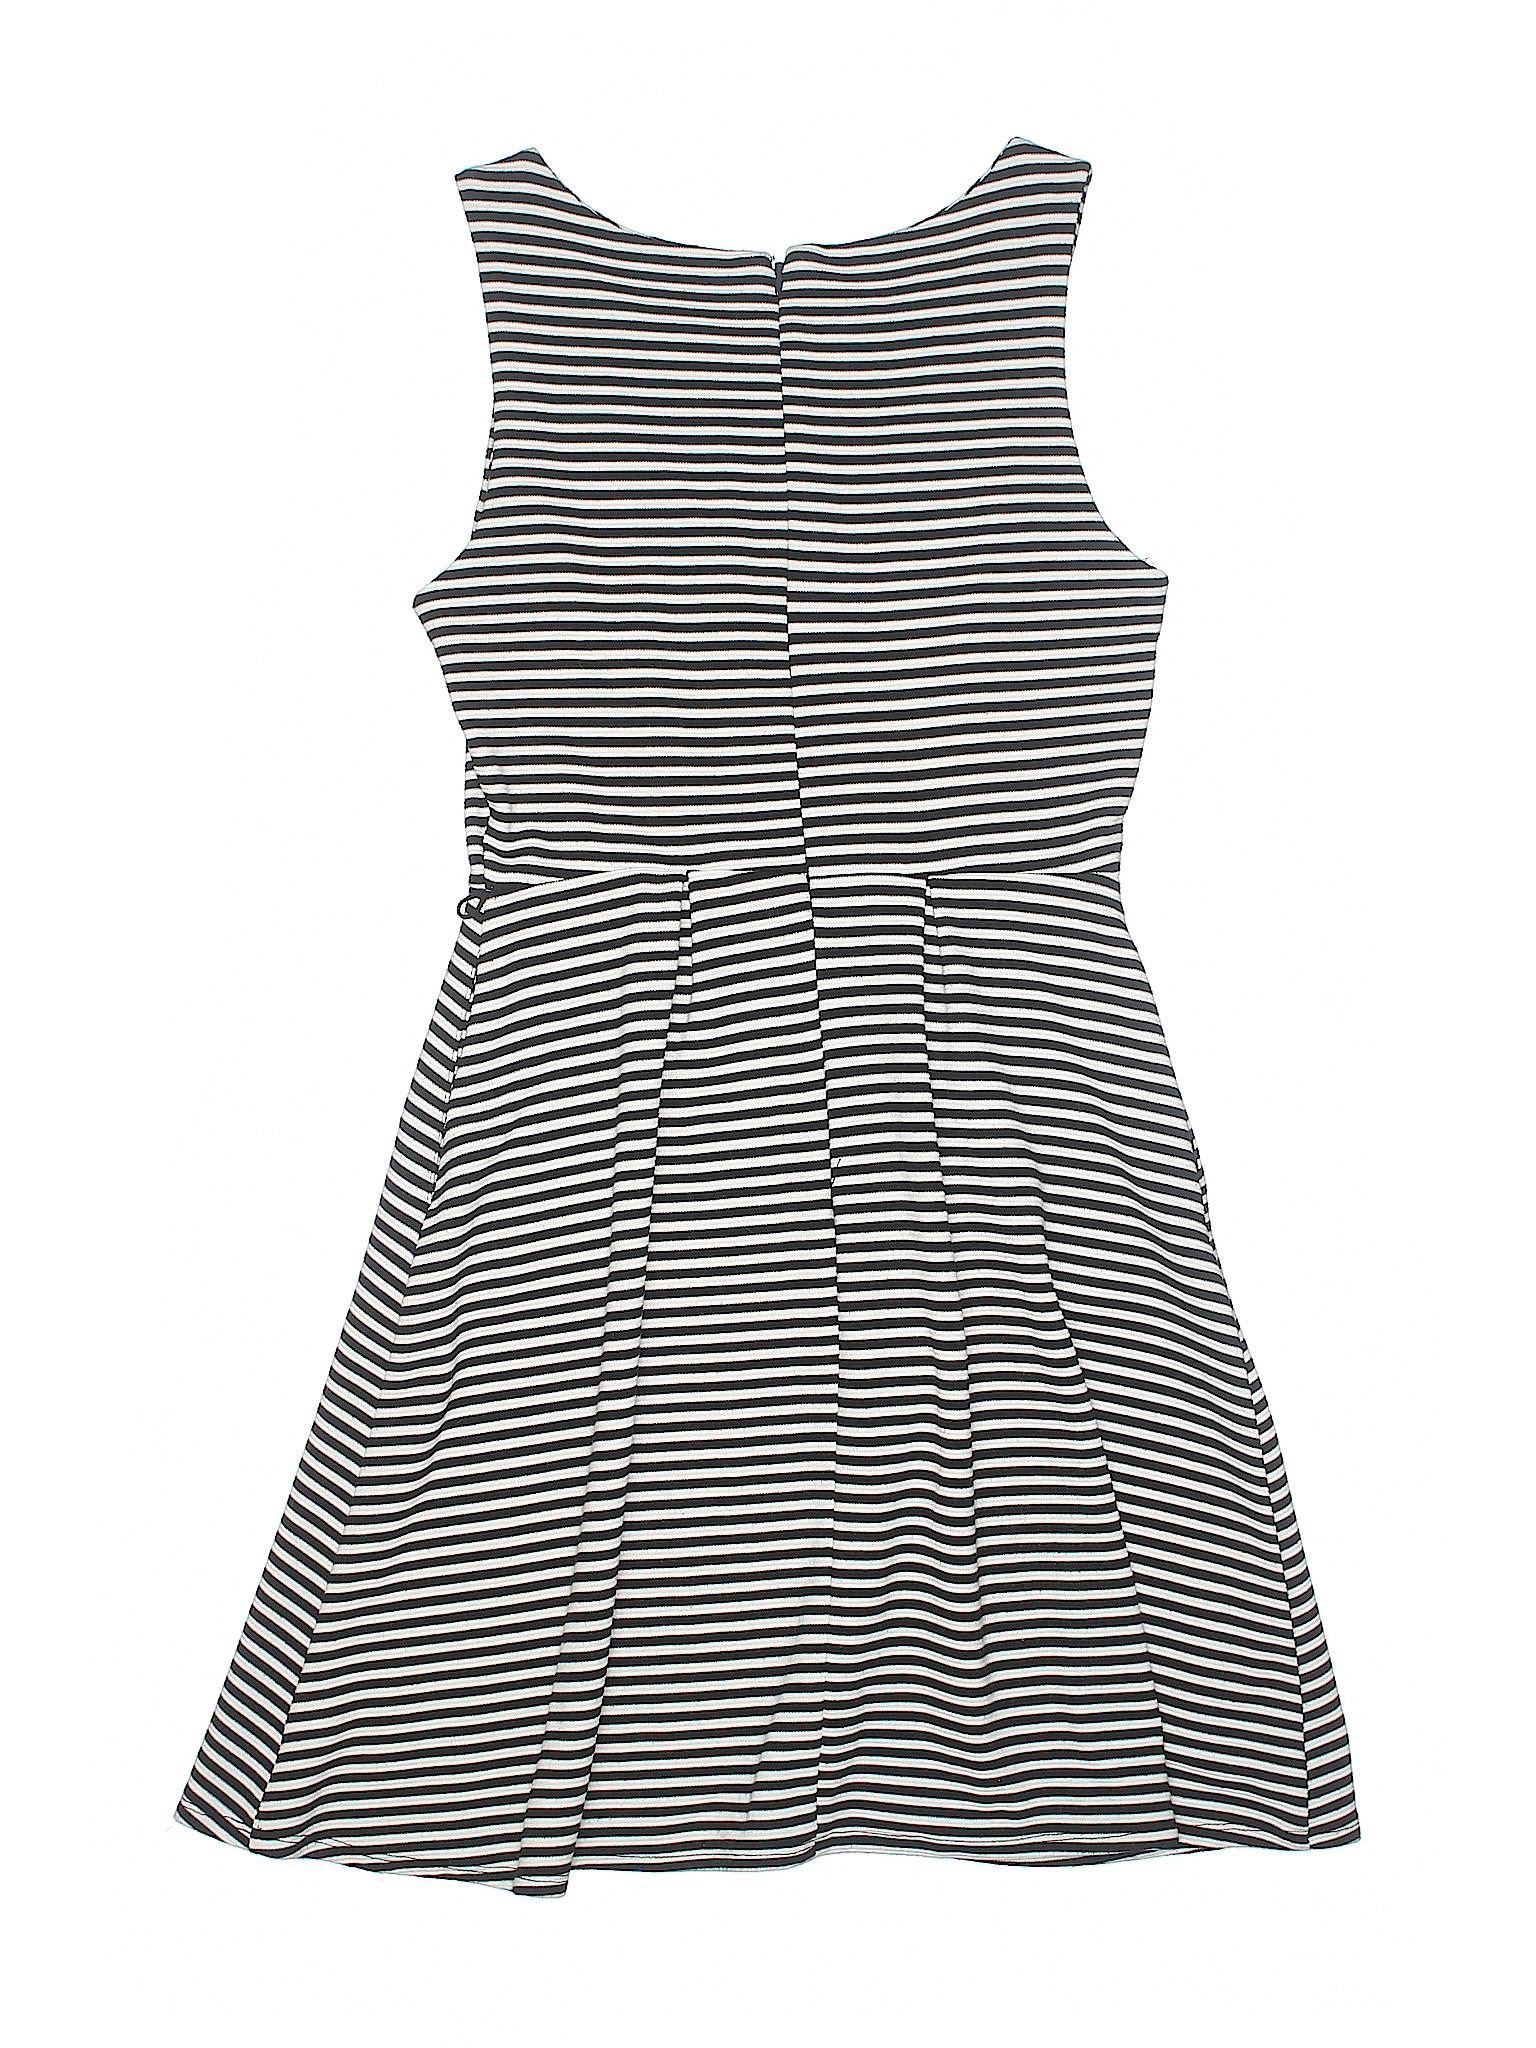 Selling Merona Casual Selling Dress Merona fqdBwxSBR